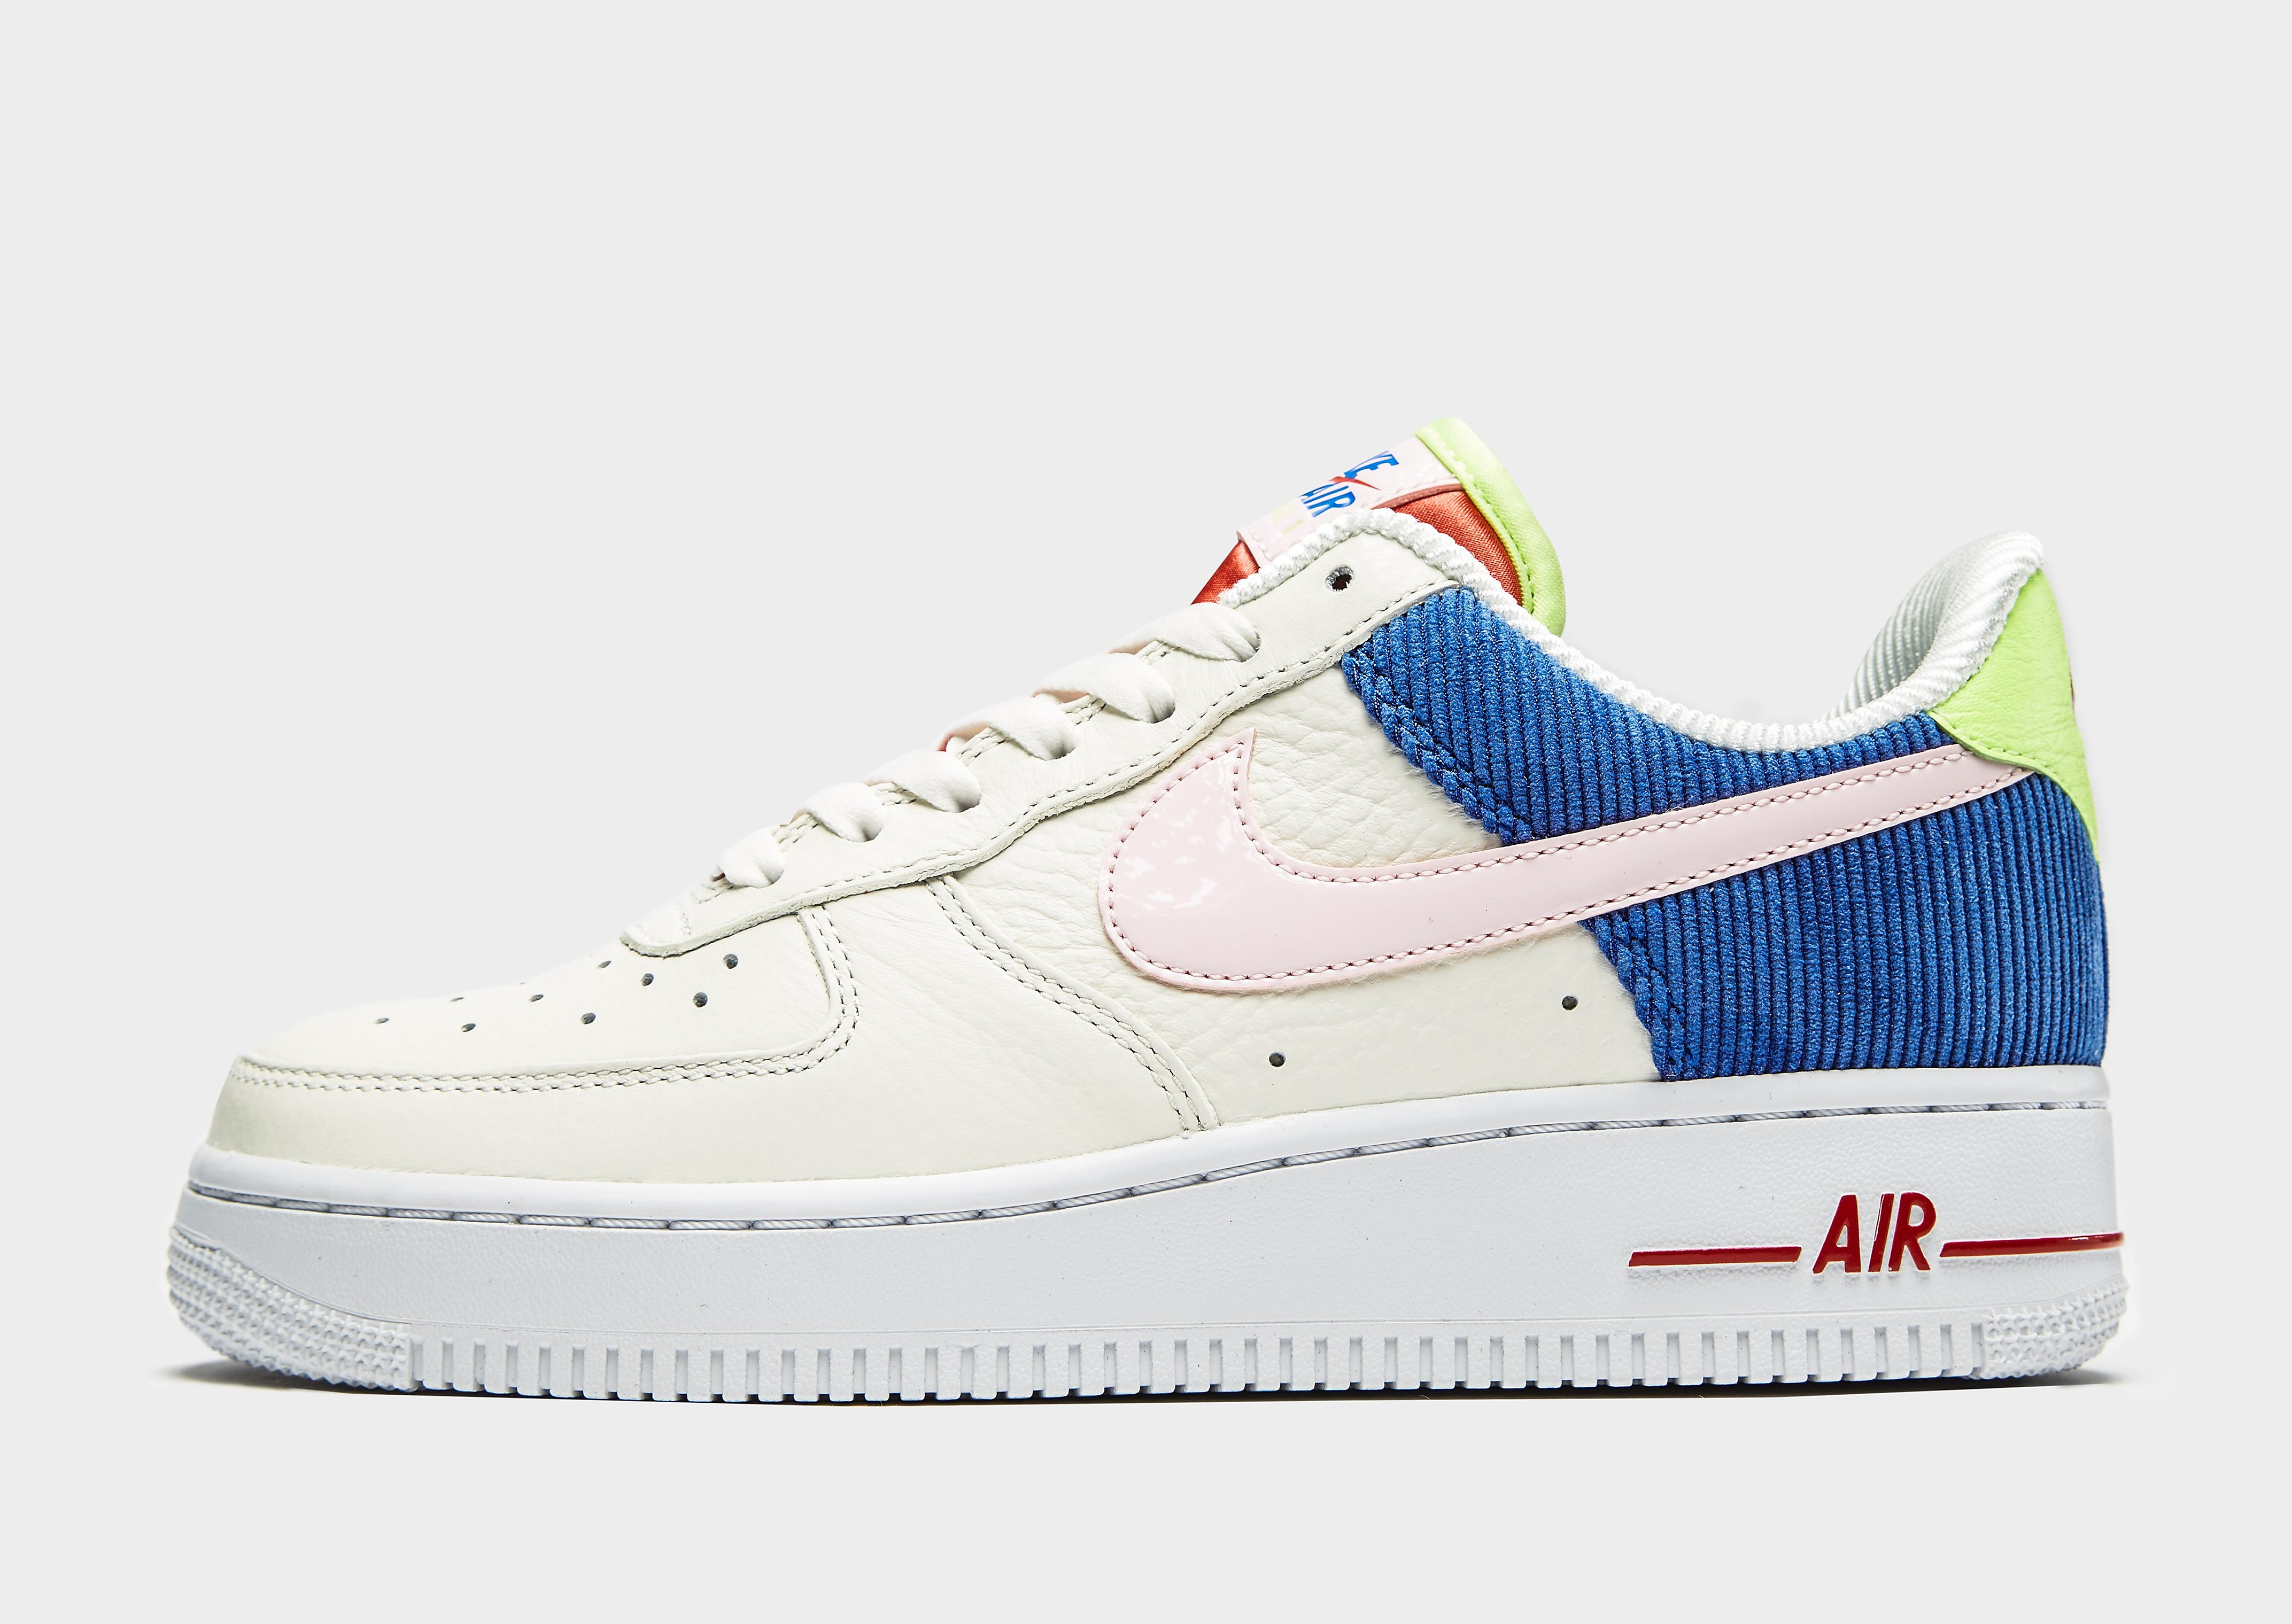 Nike Air Force 1 Low Dame